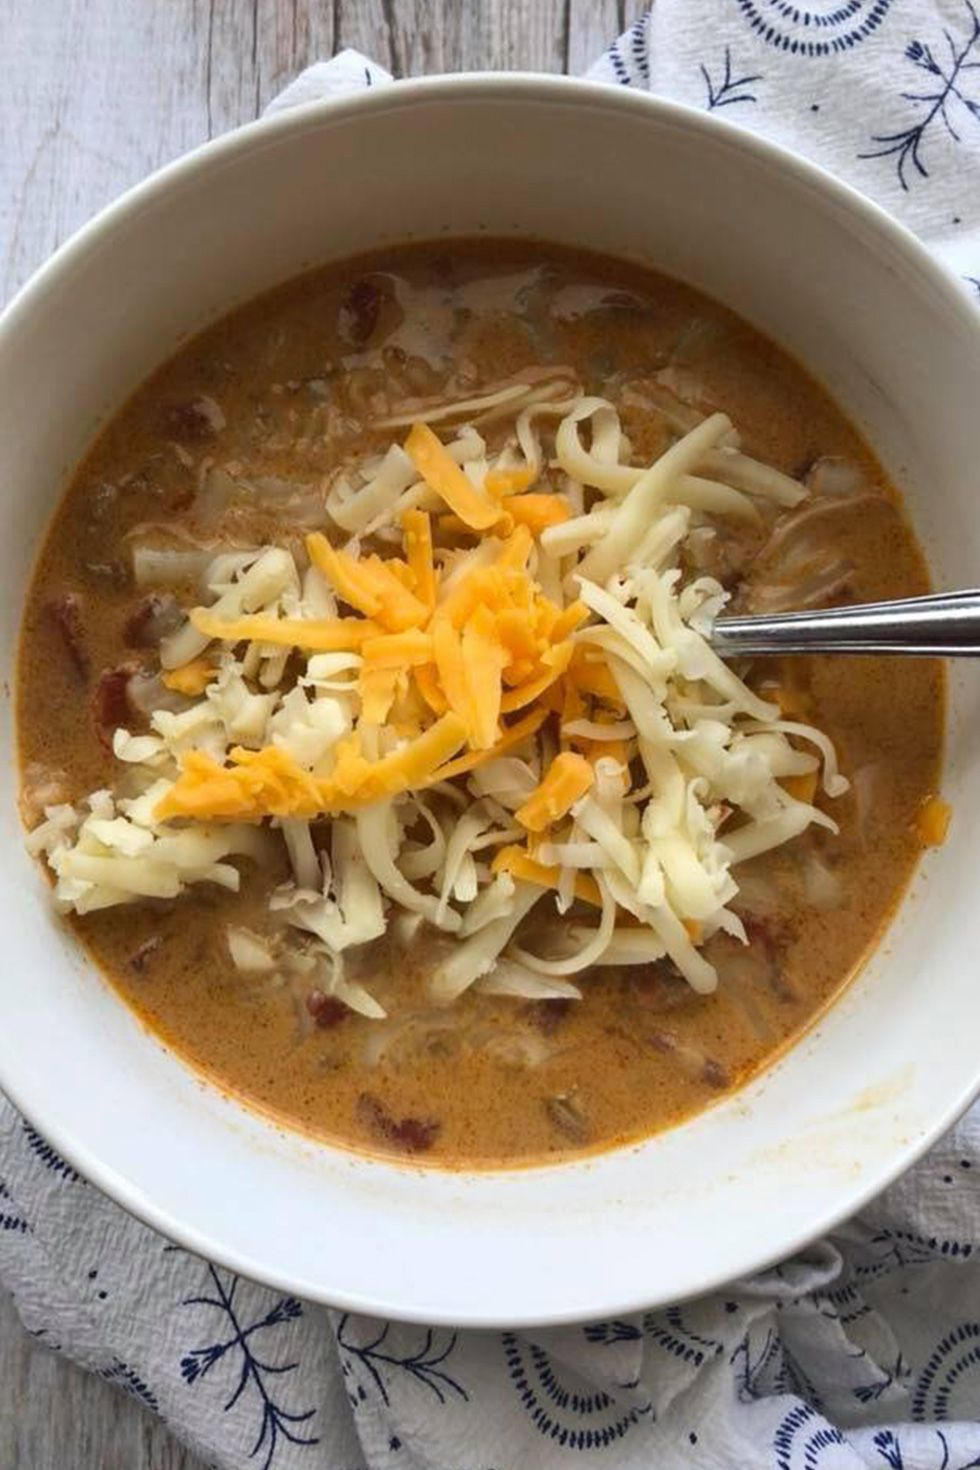 17 Best Keto Diet-Friendly Soup Recipes - High-Fat, Low-Carb